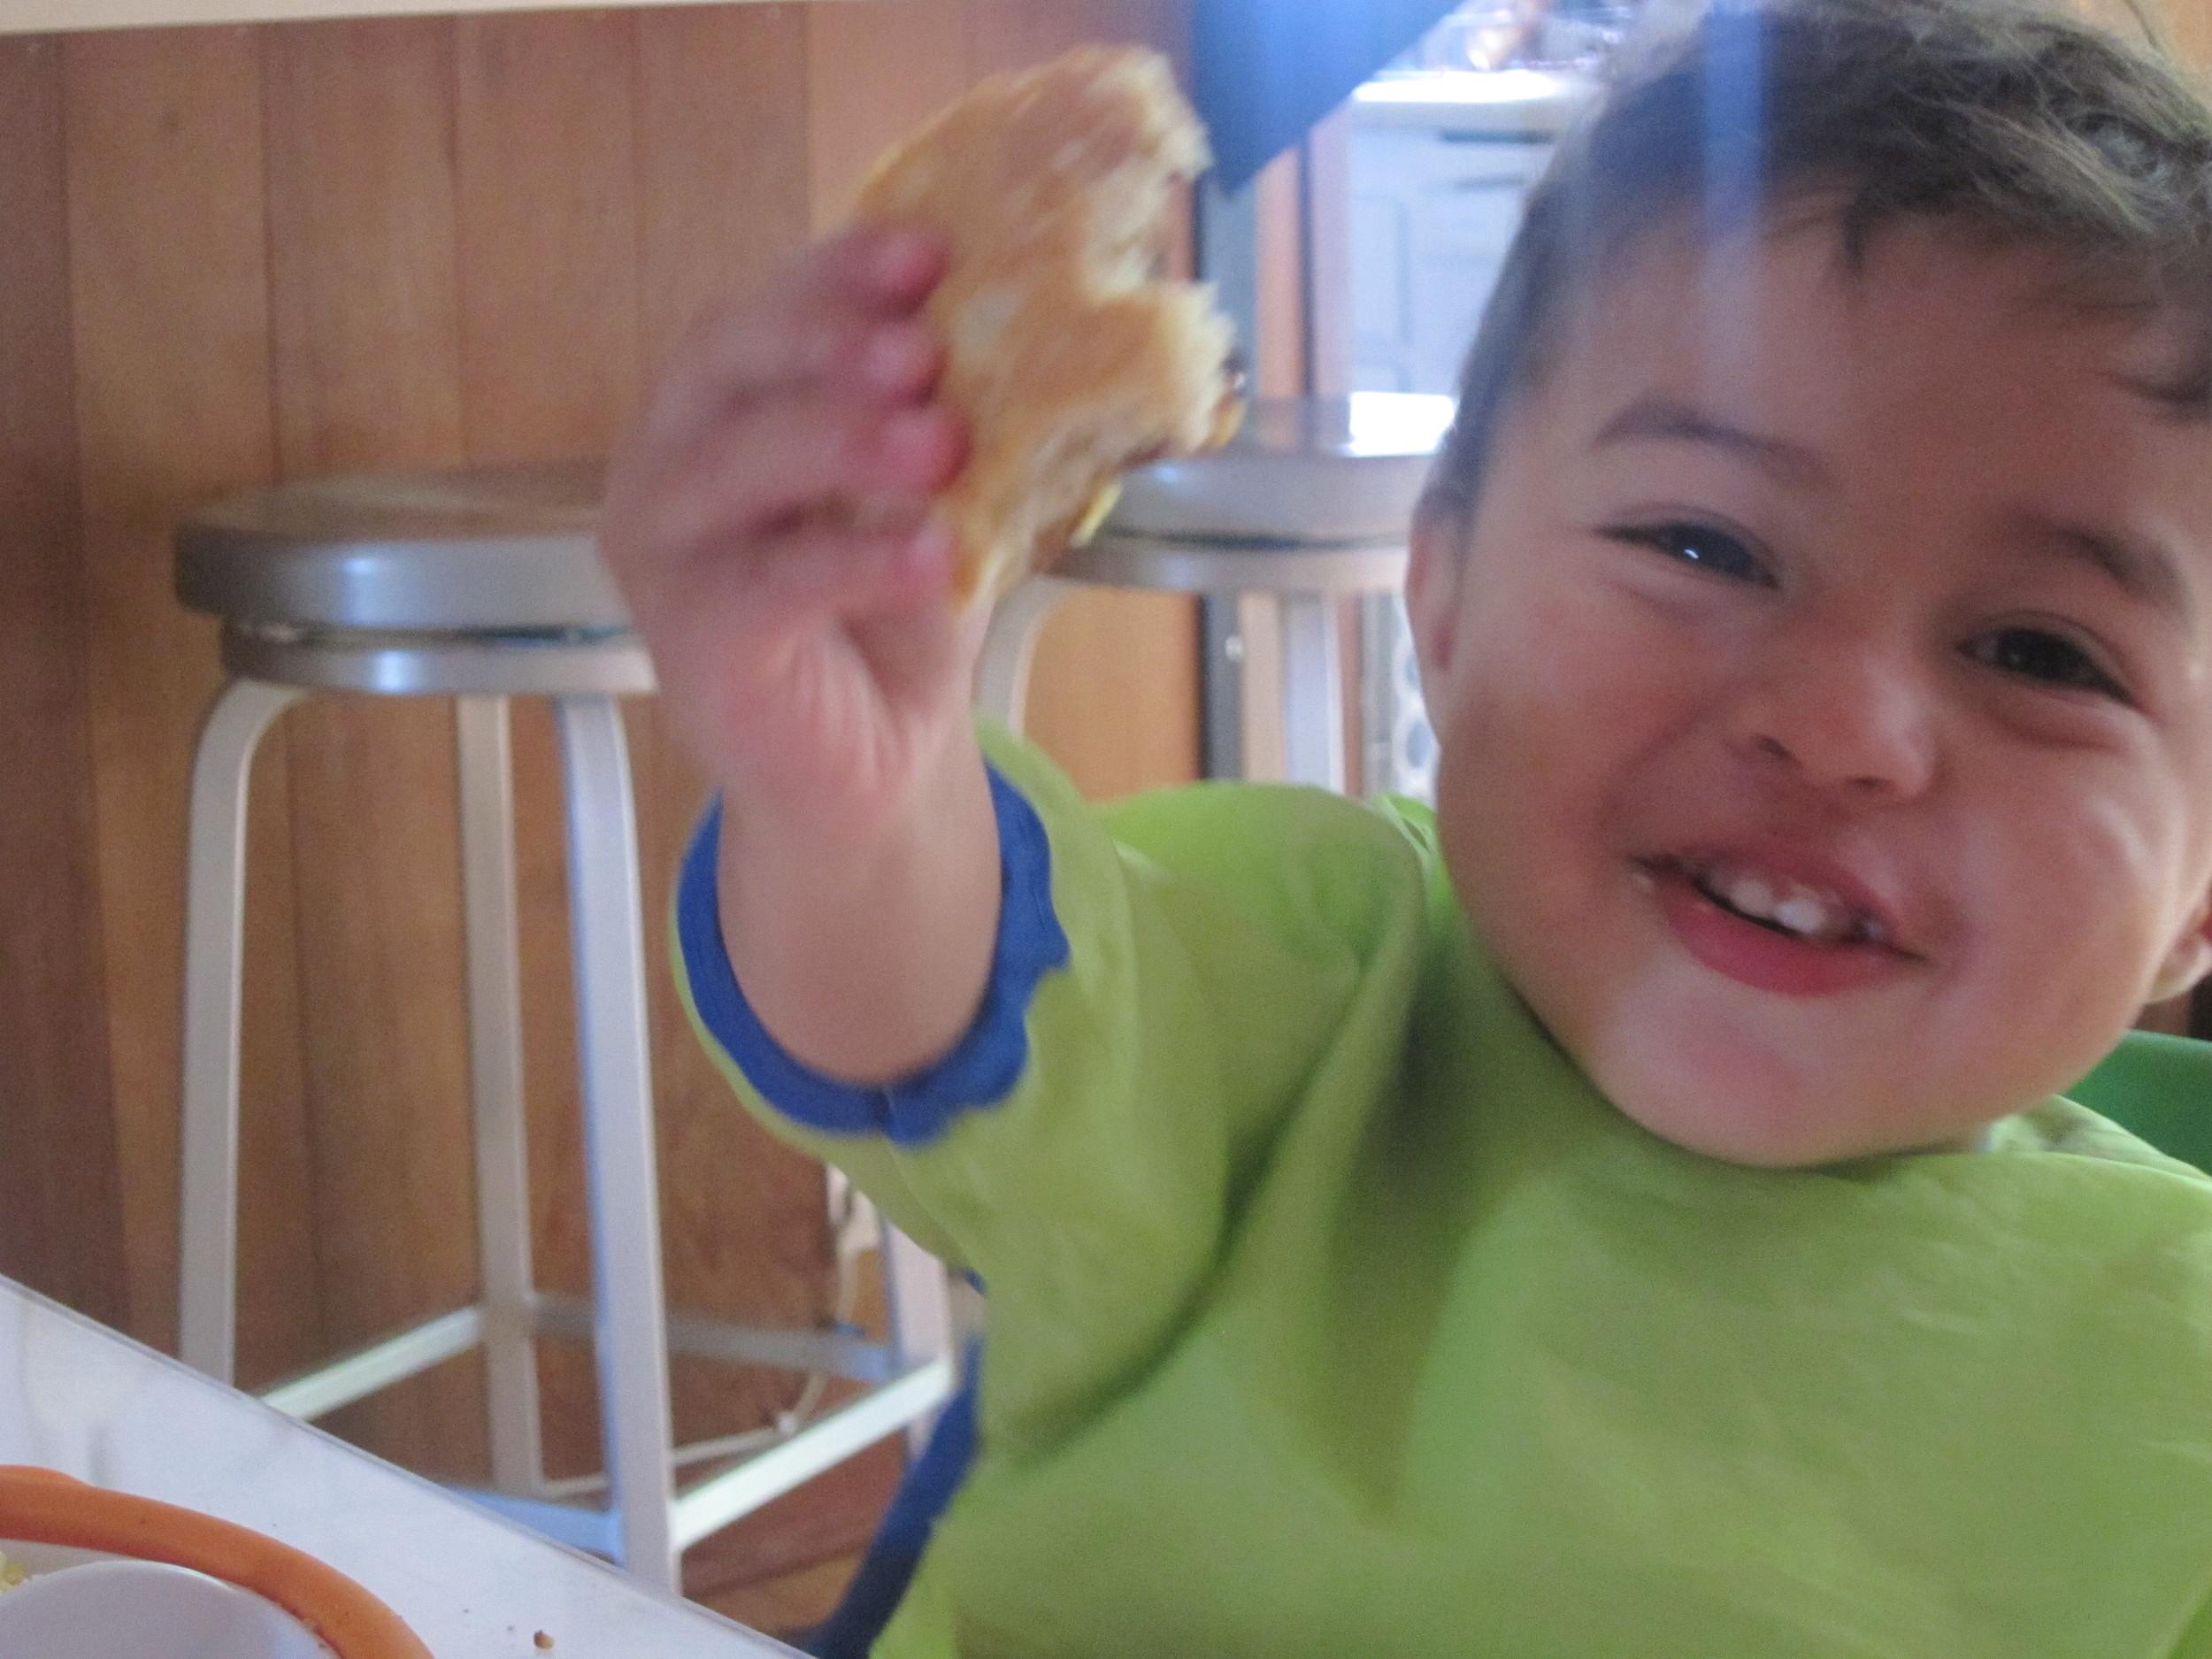 Elian eats Arepas